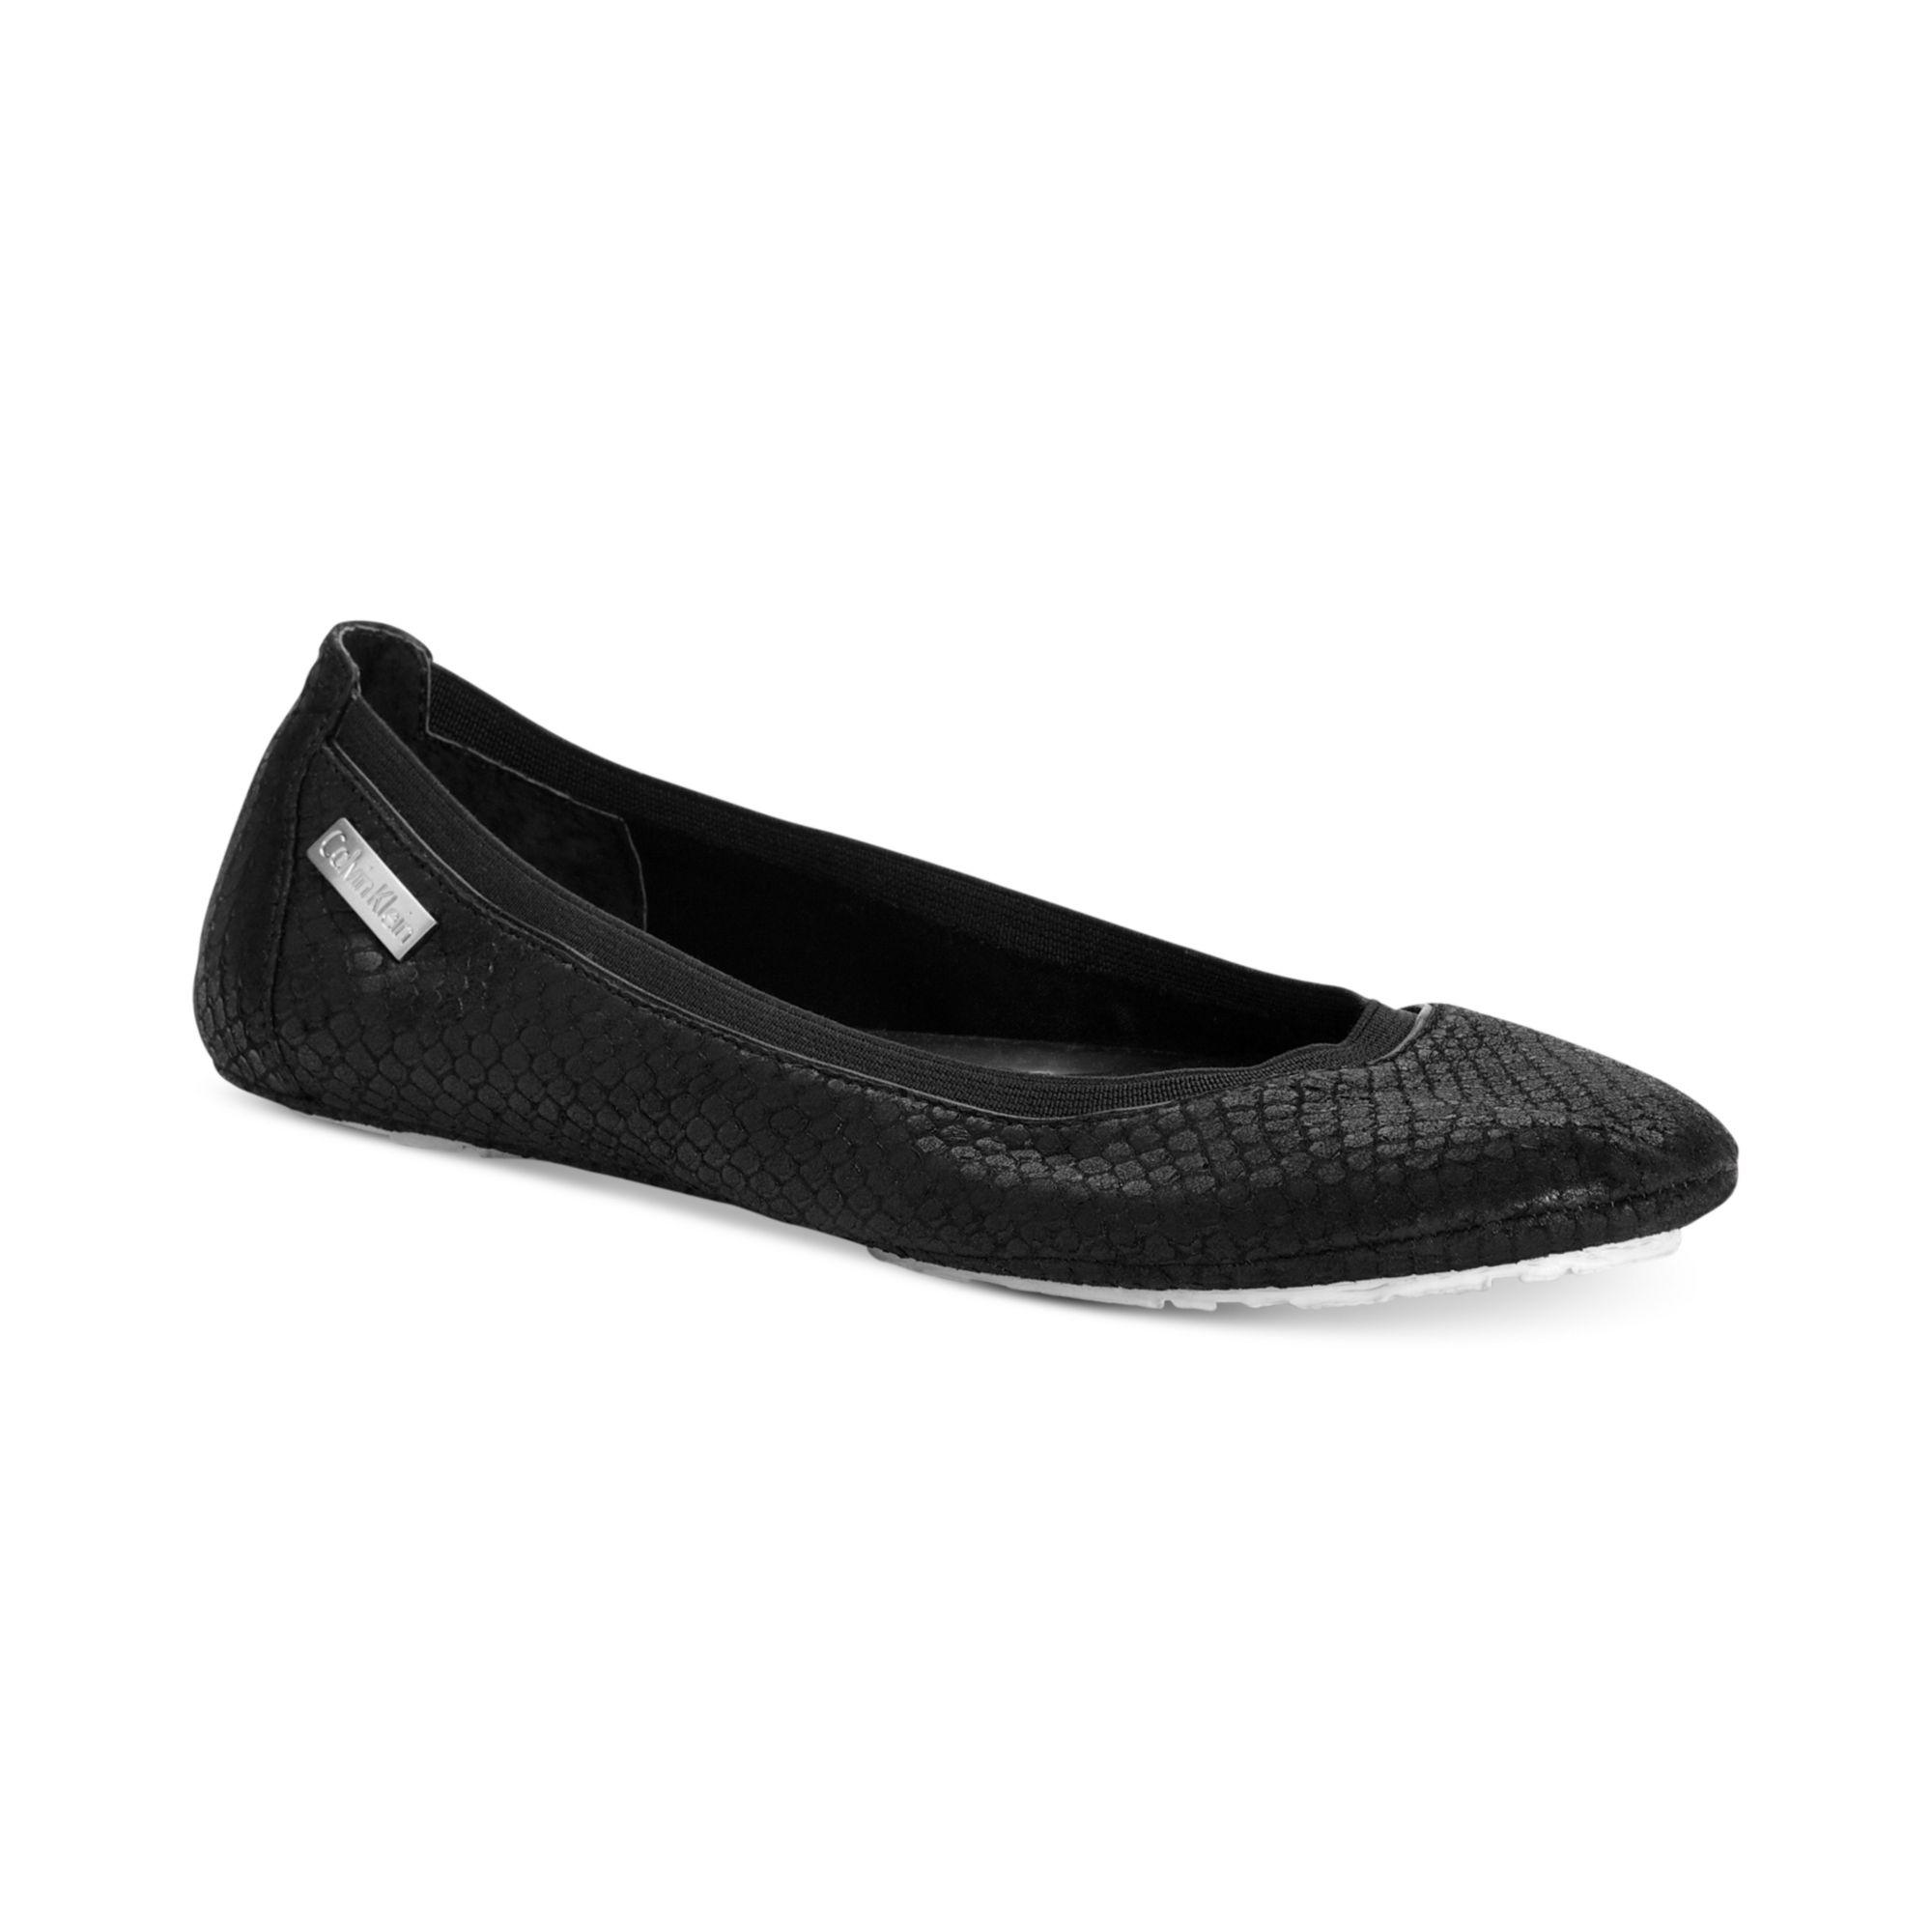 Calvin Klein Womens Maida Flats In Black (Black Embossed Snake) | Lyst